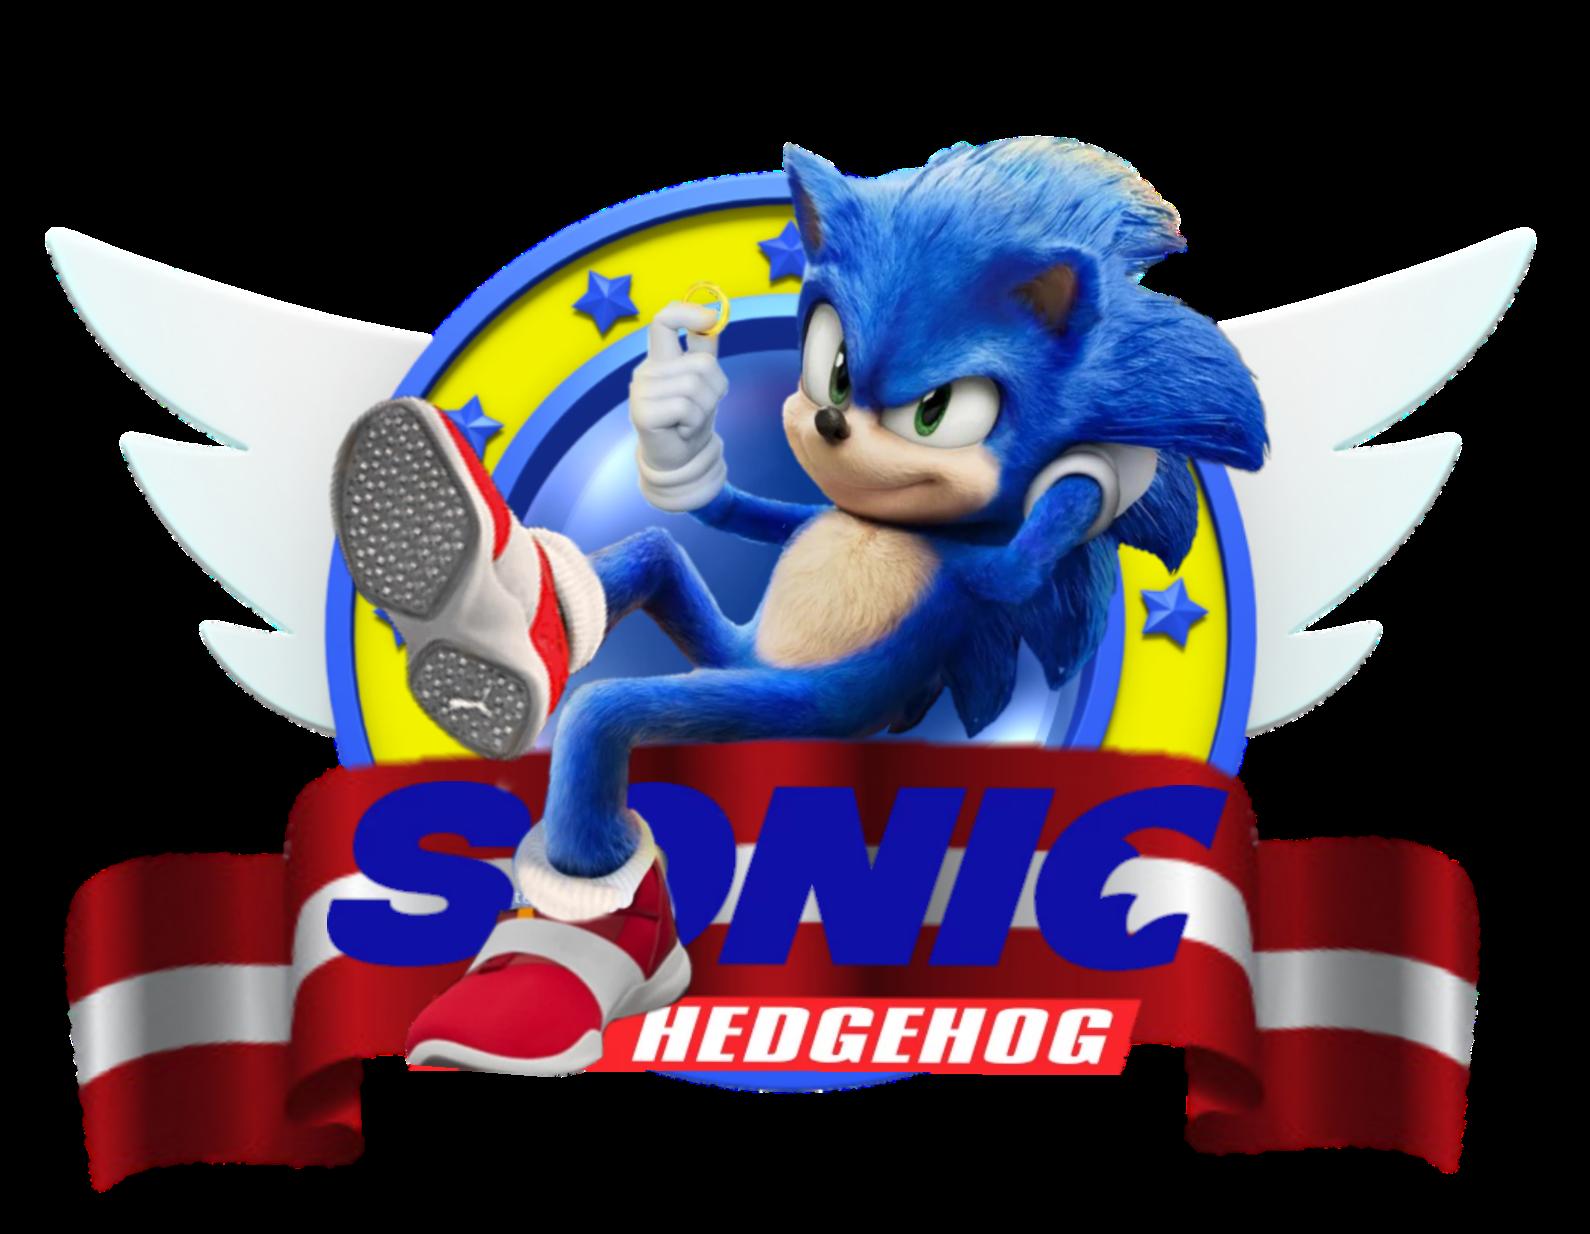 Sonic The Hedgehog Logo Sonic The Hedgehog Sonic Hedgehog